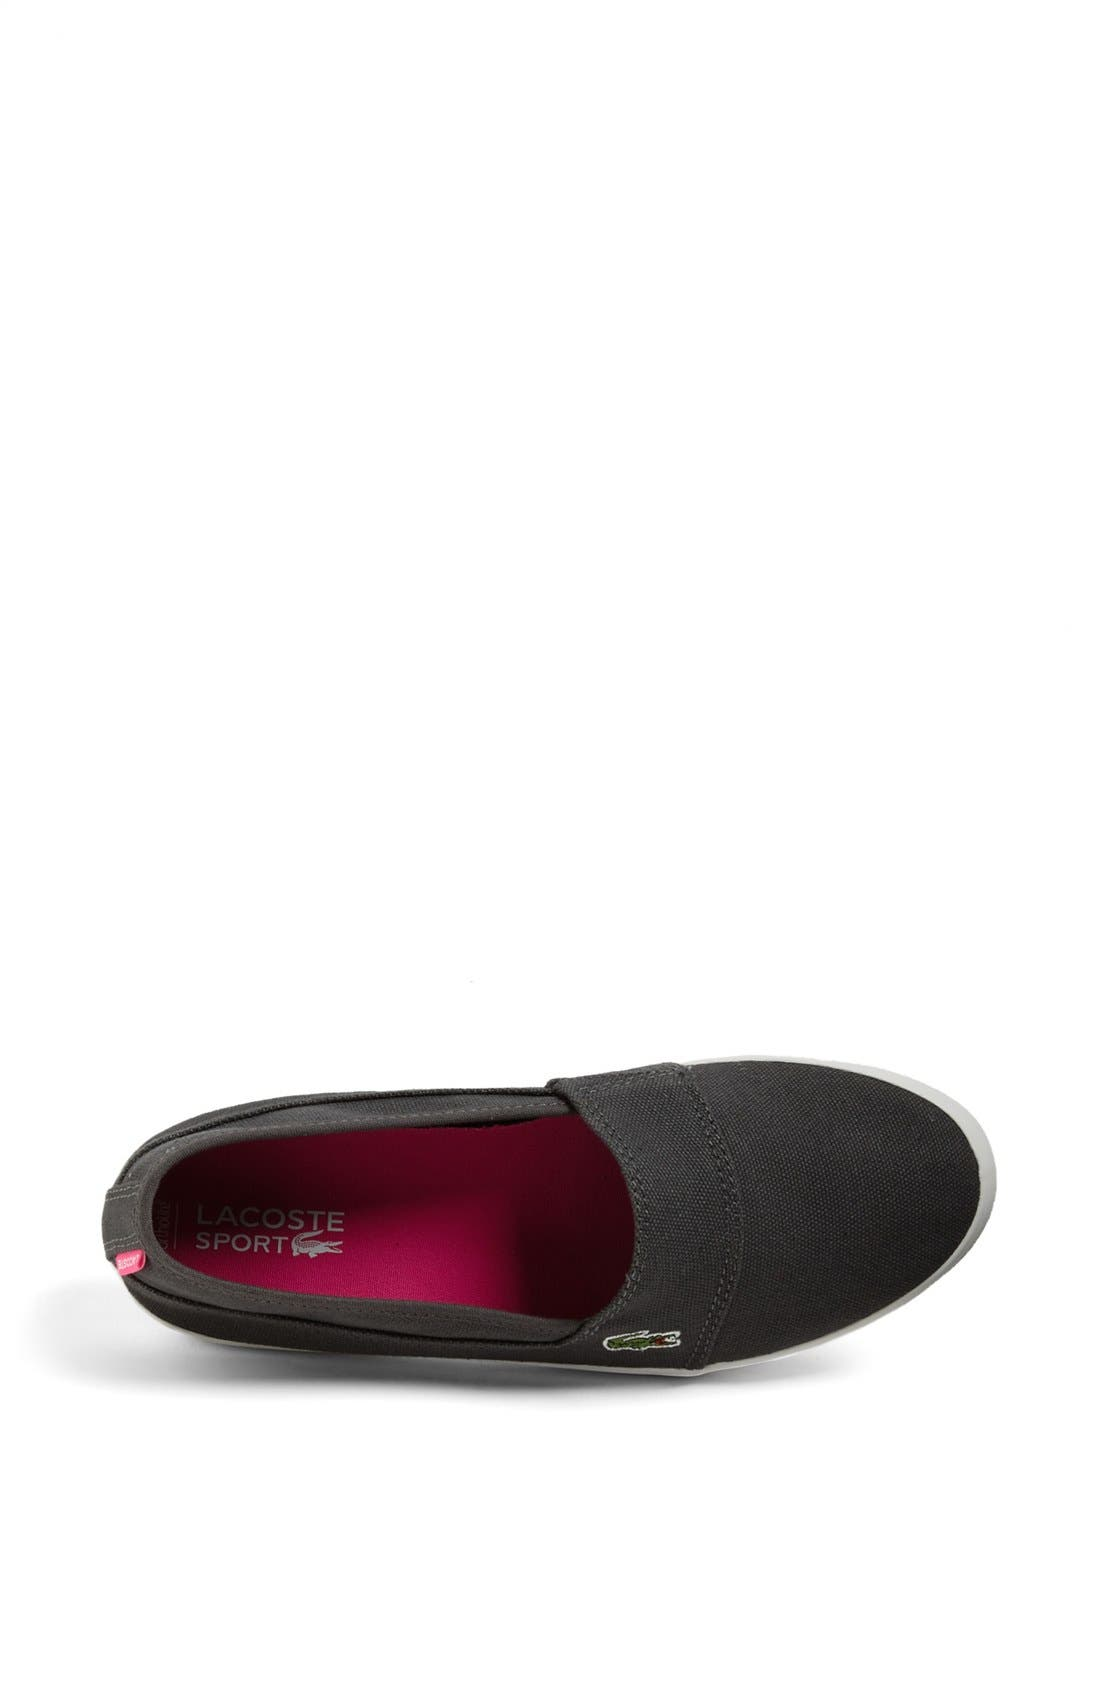 Alternate Image 2  - Lacoste 'Maurice' Sneaker (Women) (Online Only)